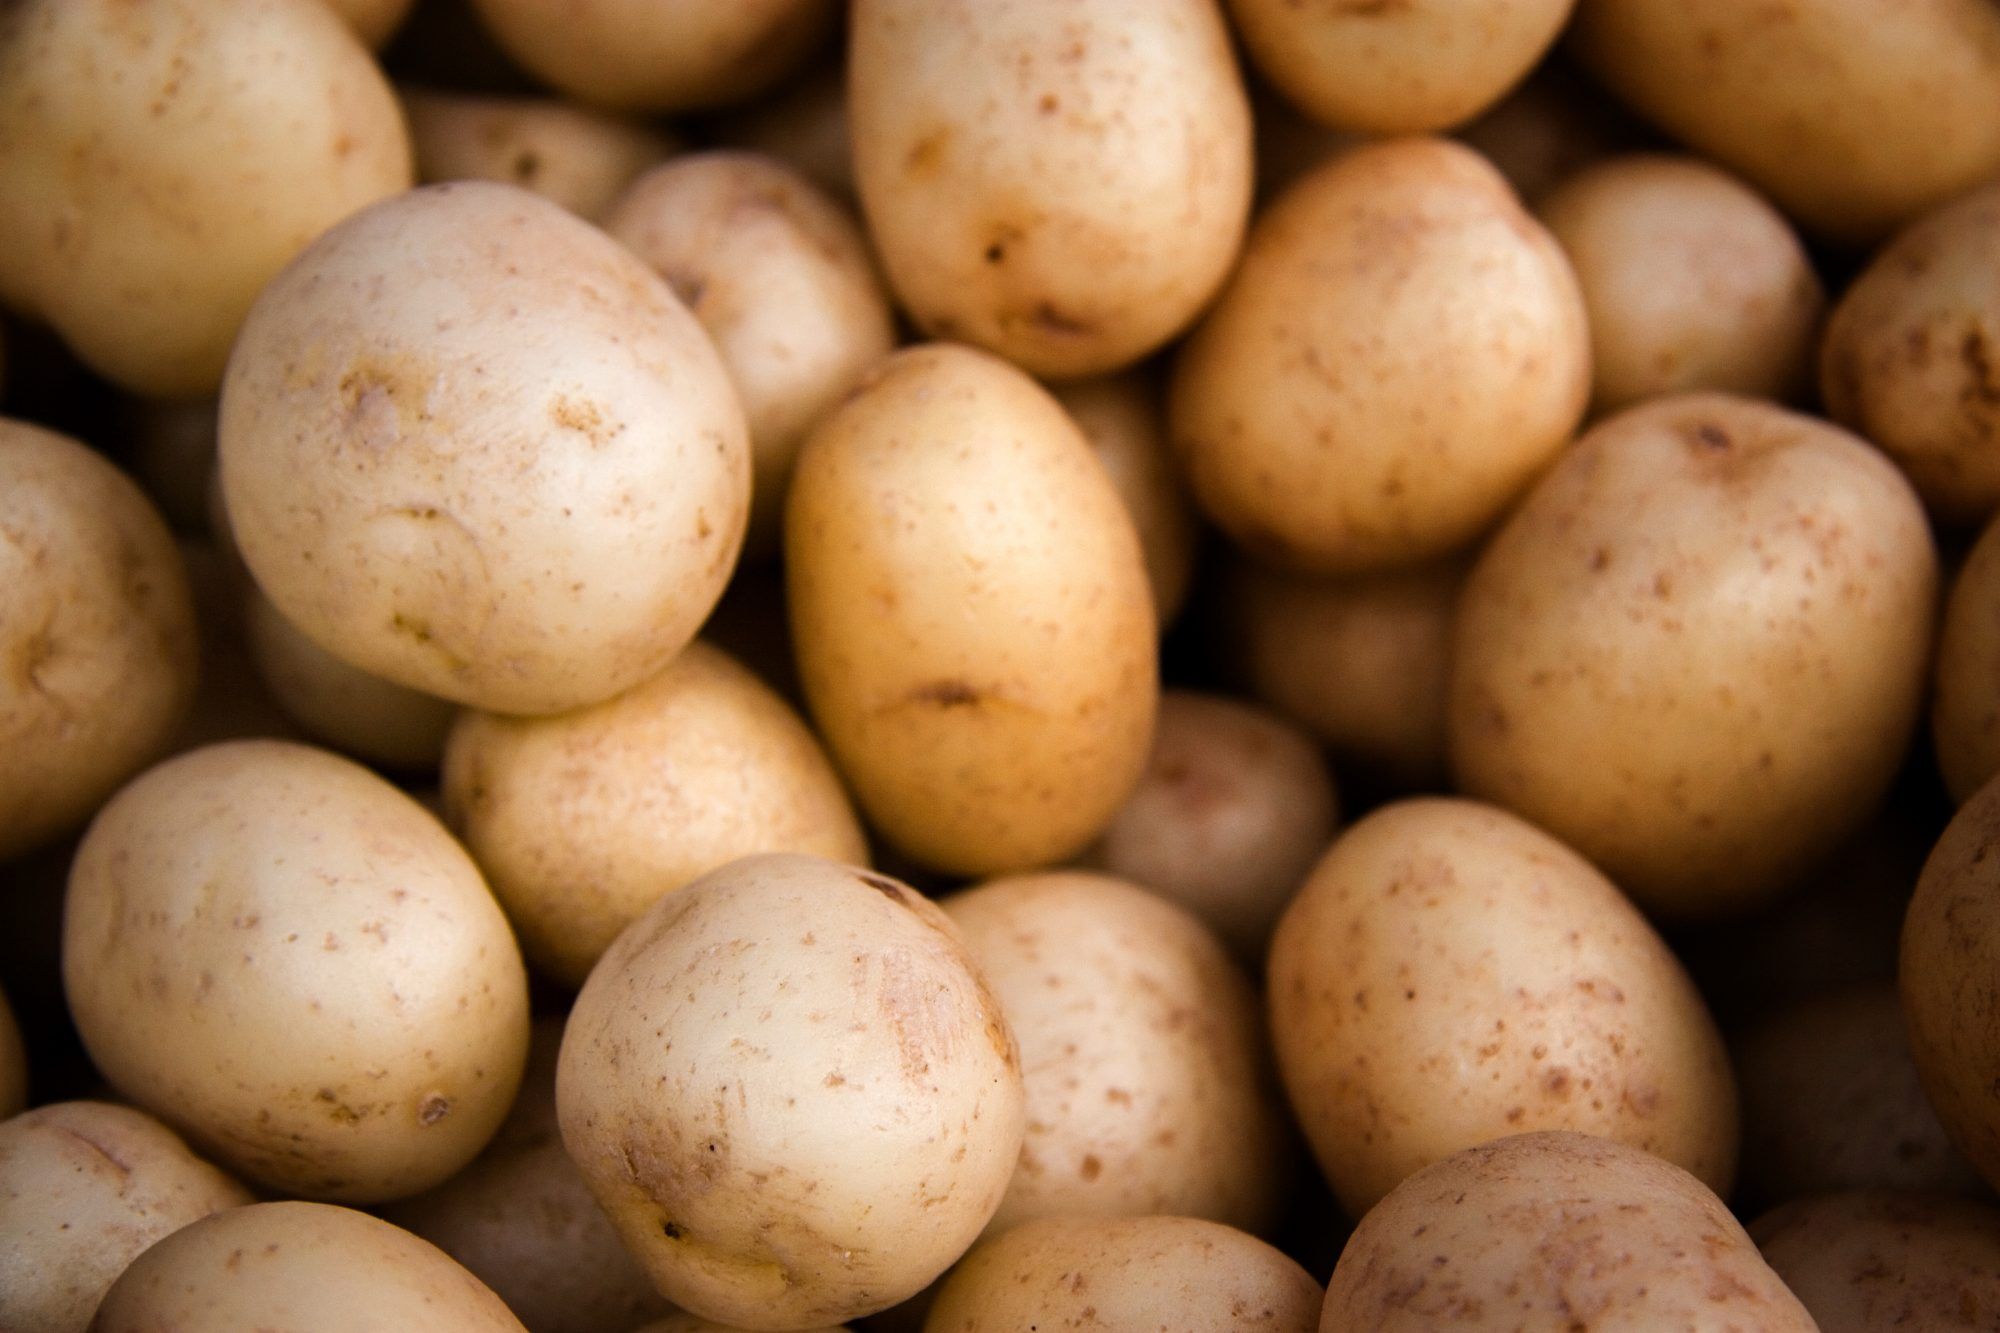 Potatoes Getty 12/9/19